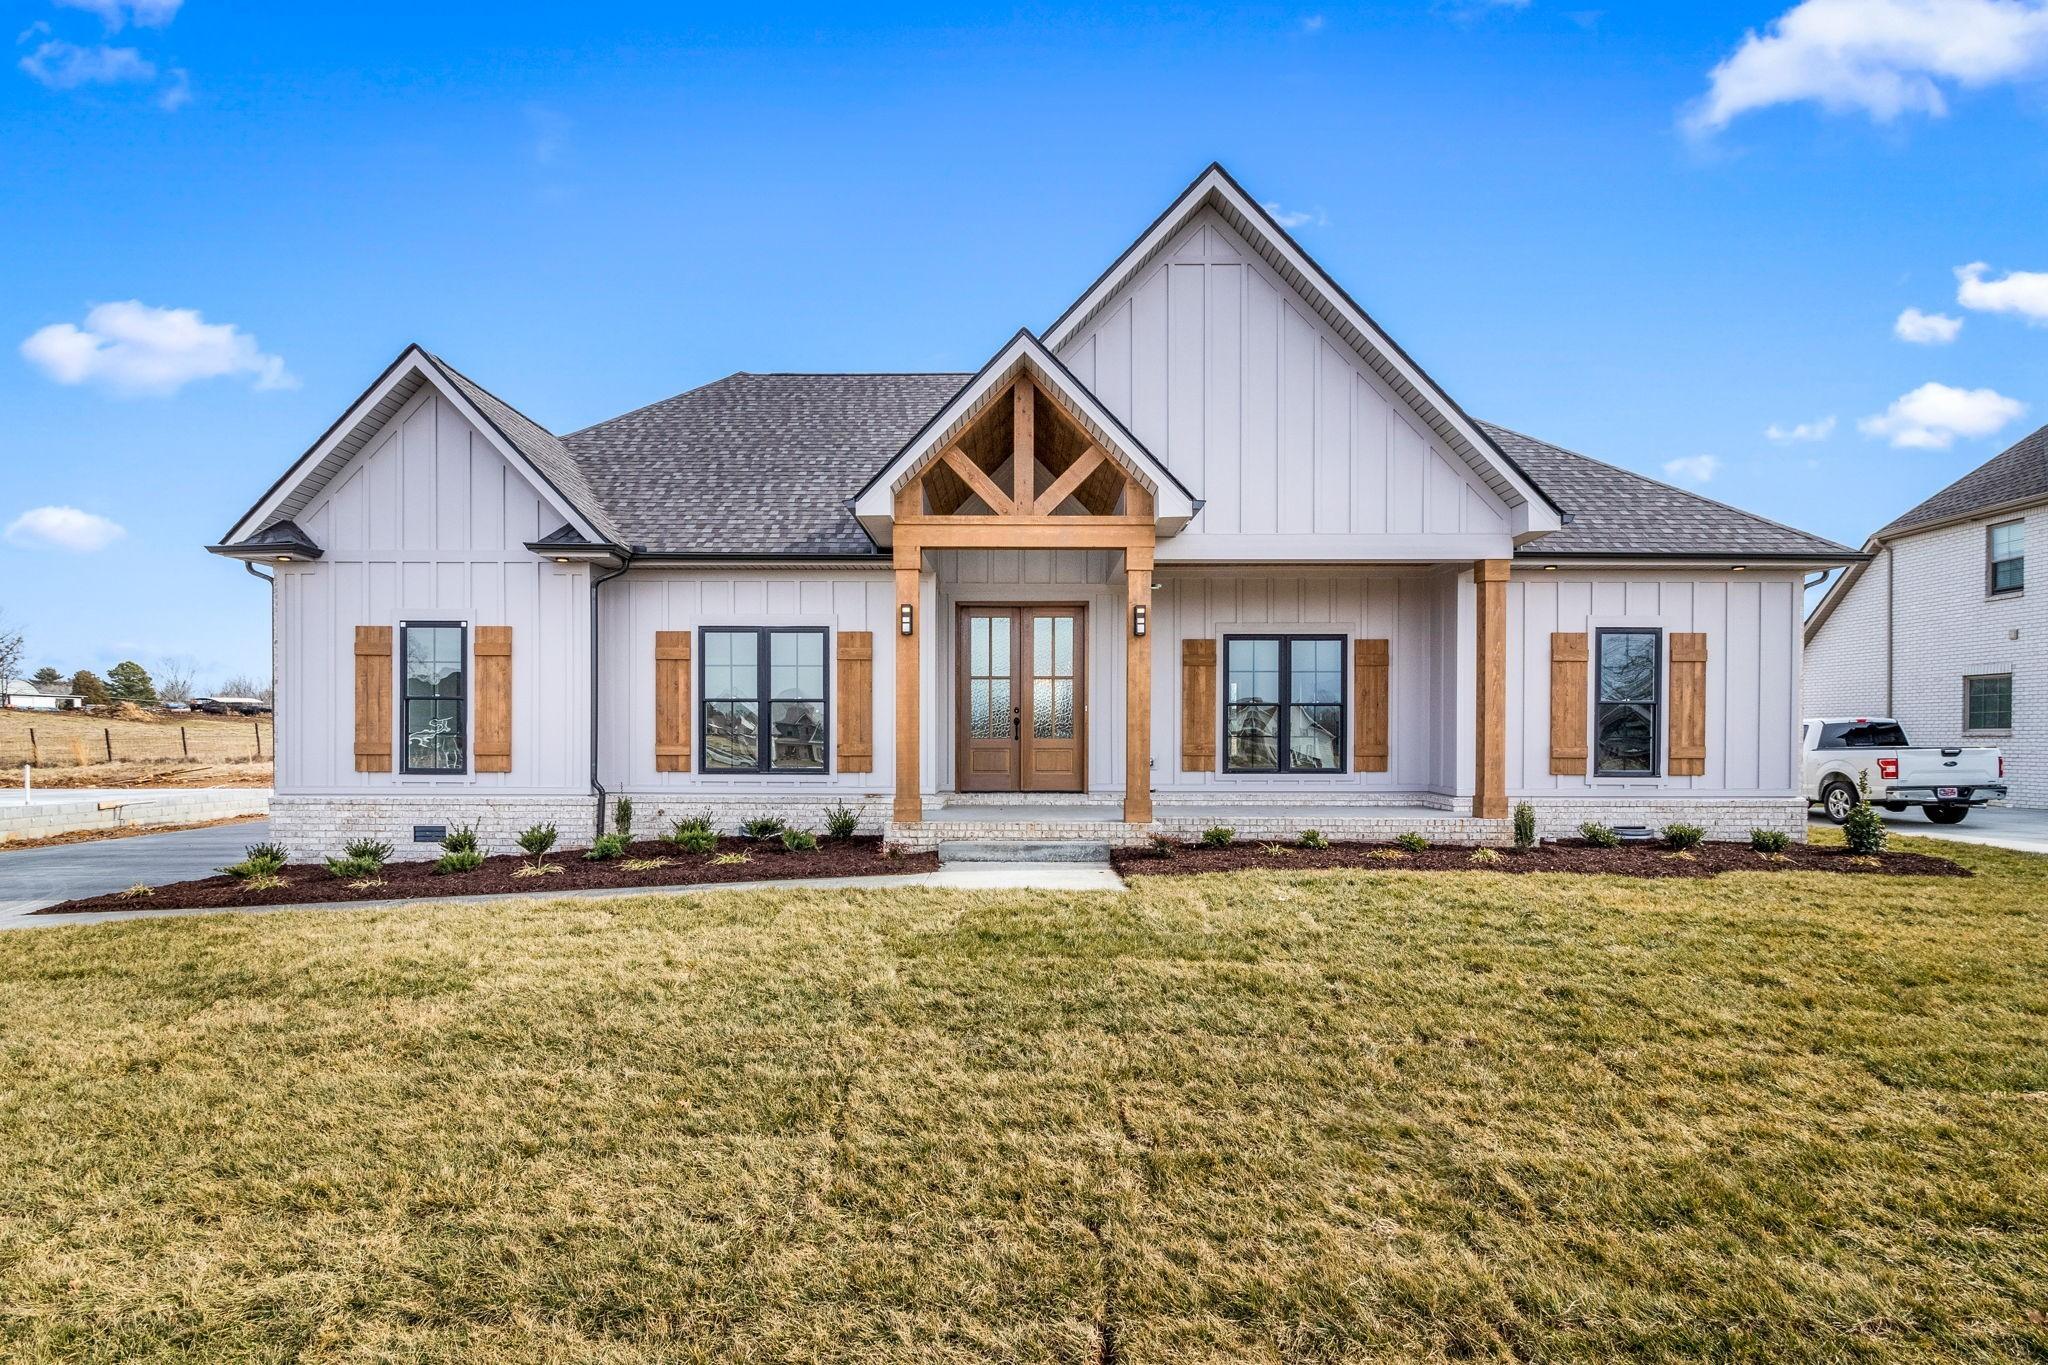 364 Ellington Dr Property Photo - Clarksville, TN real estate listing